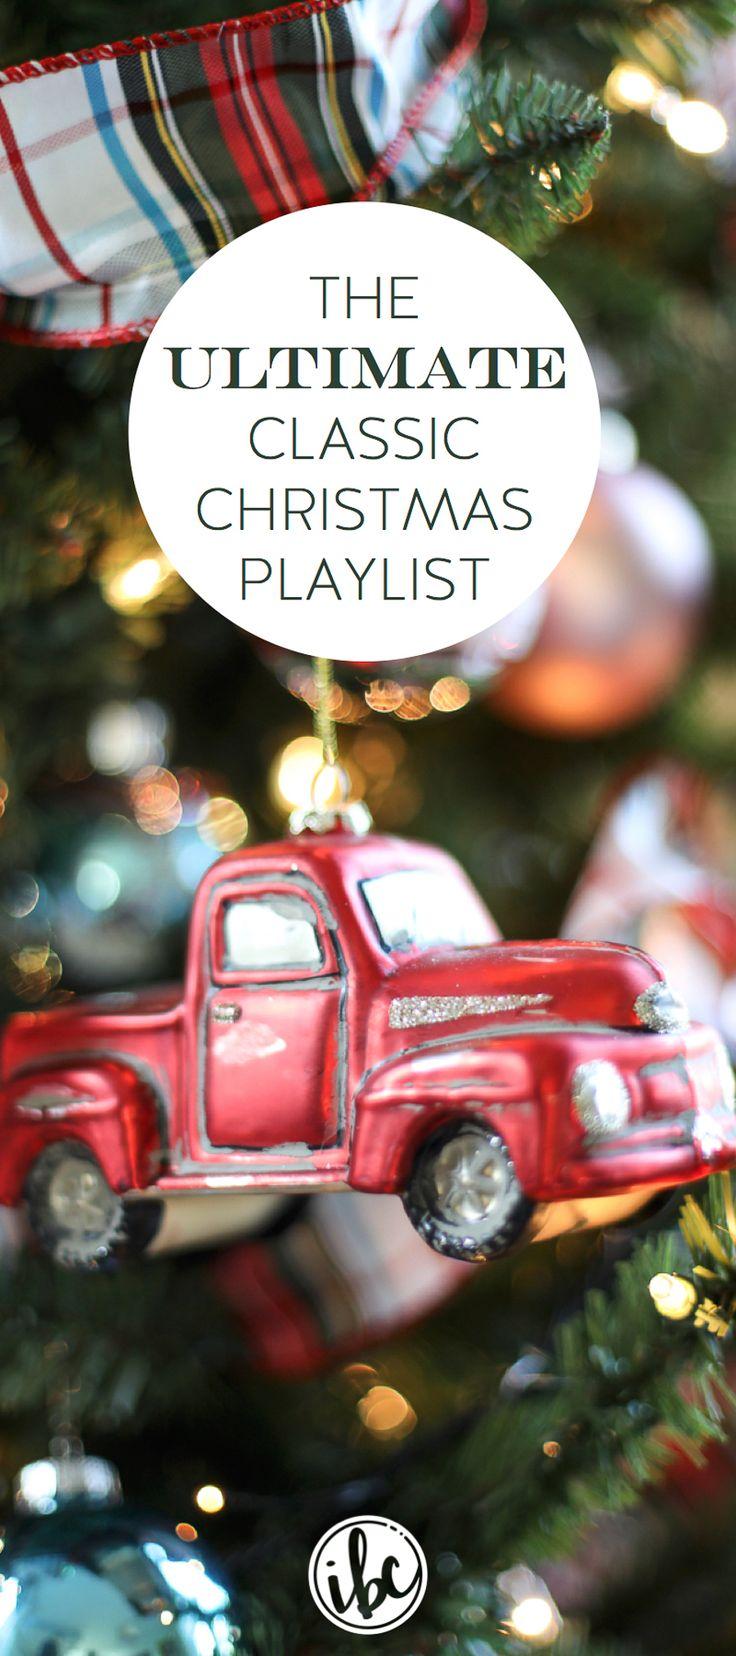 Christmas Music Playlist - The Ultimate Classic Christmas Playlist via inspiredbycharm.com